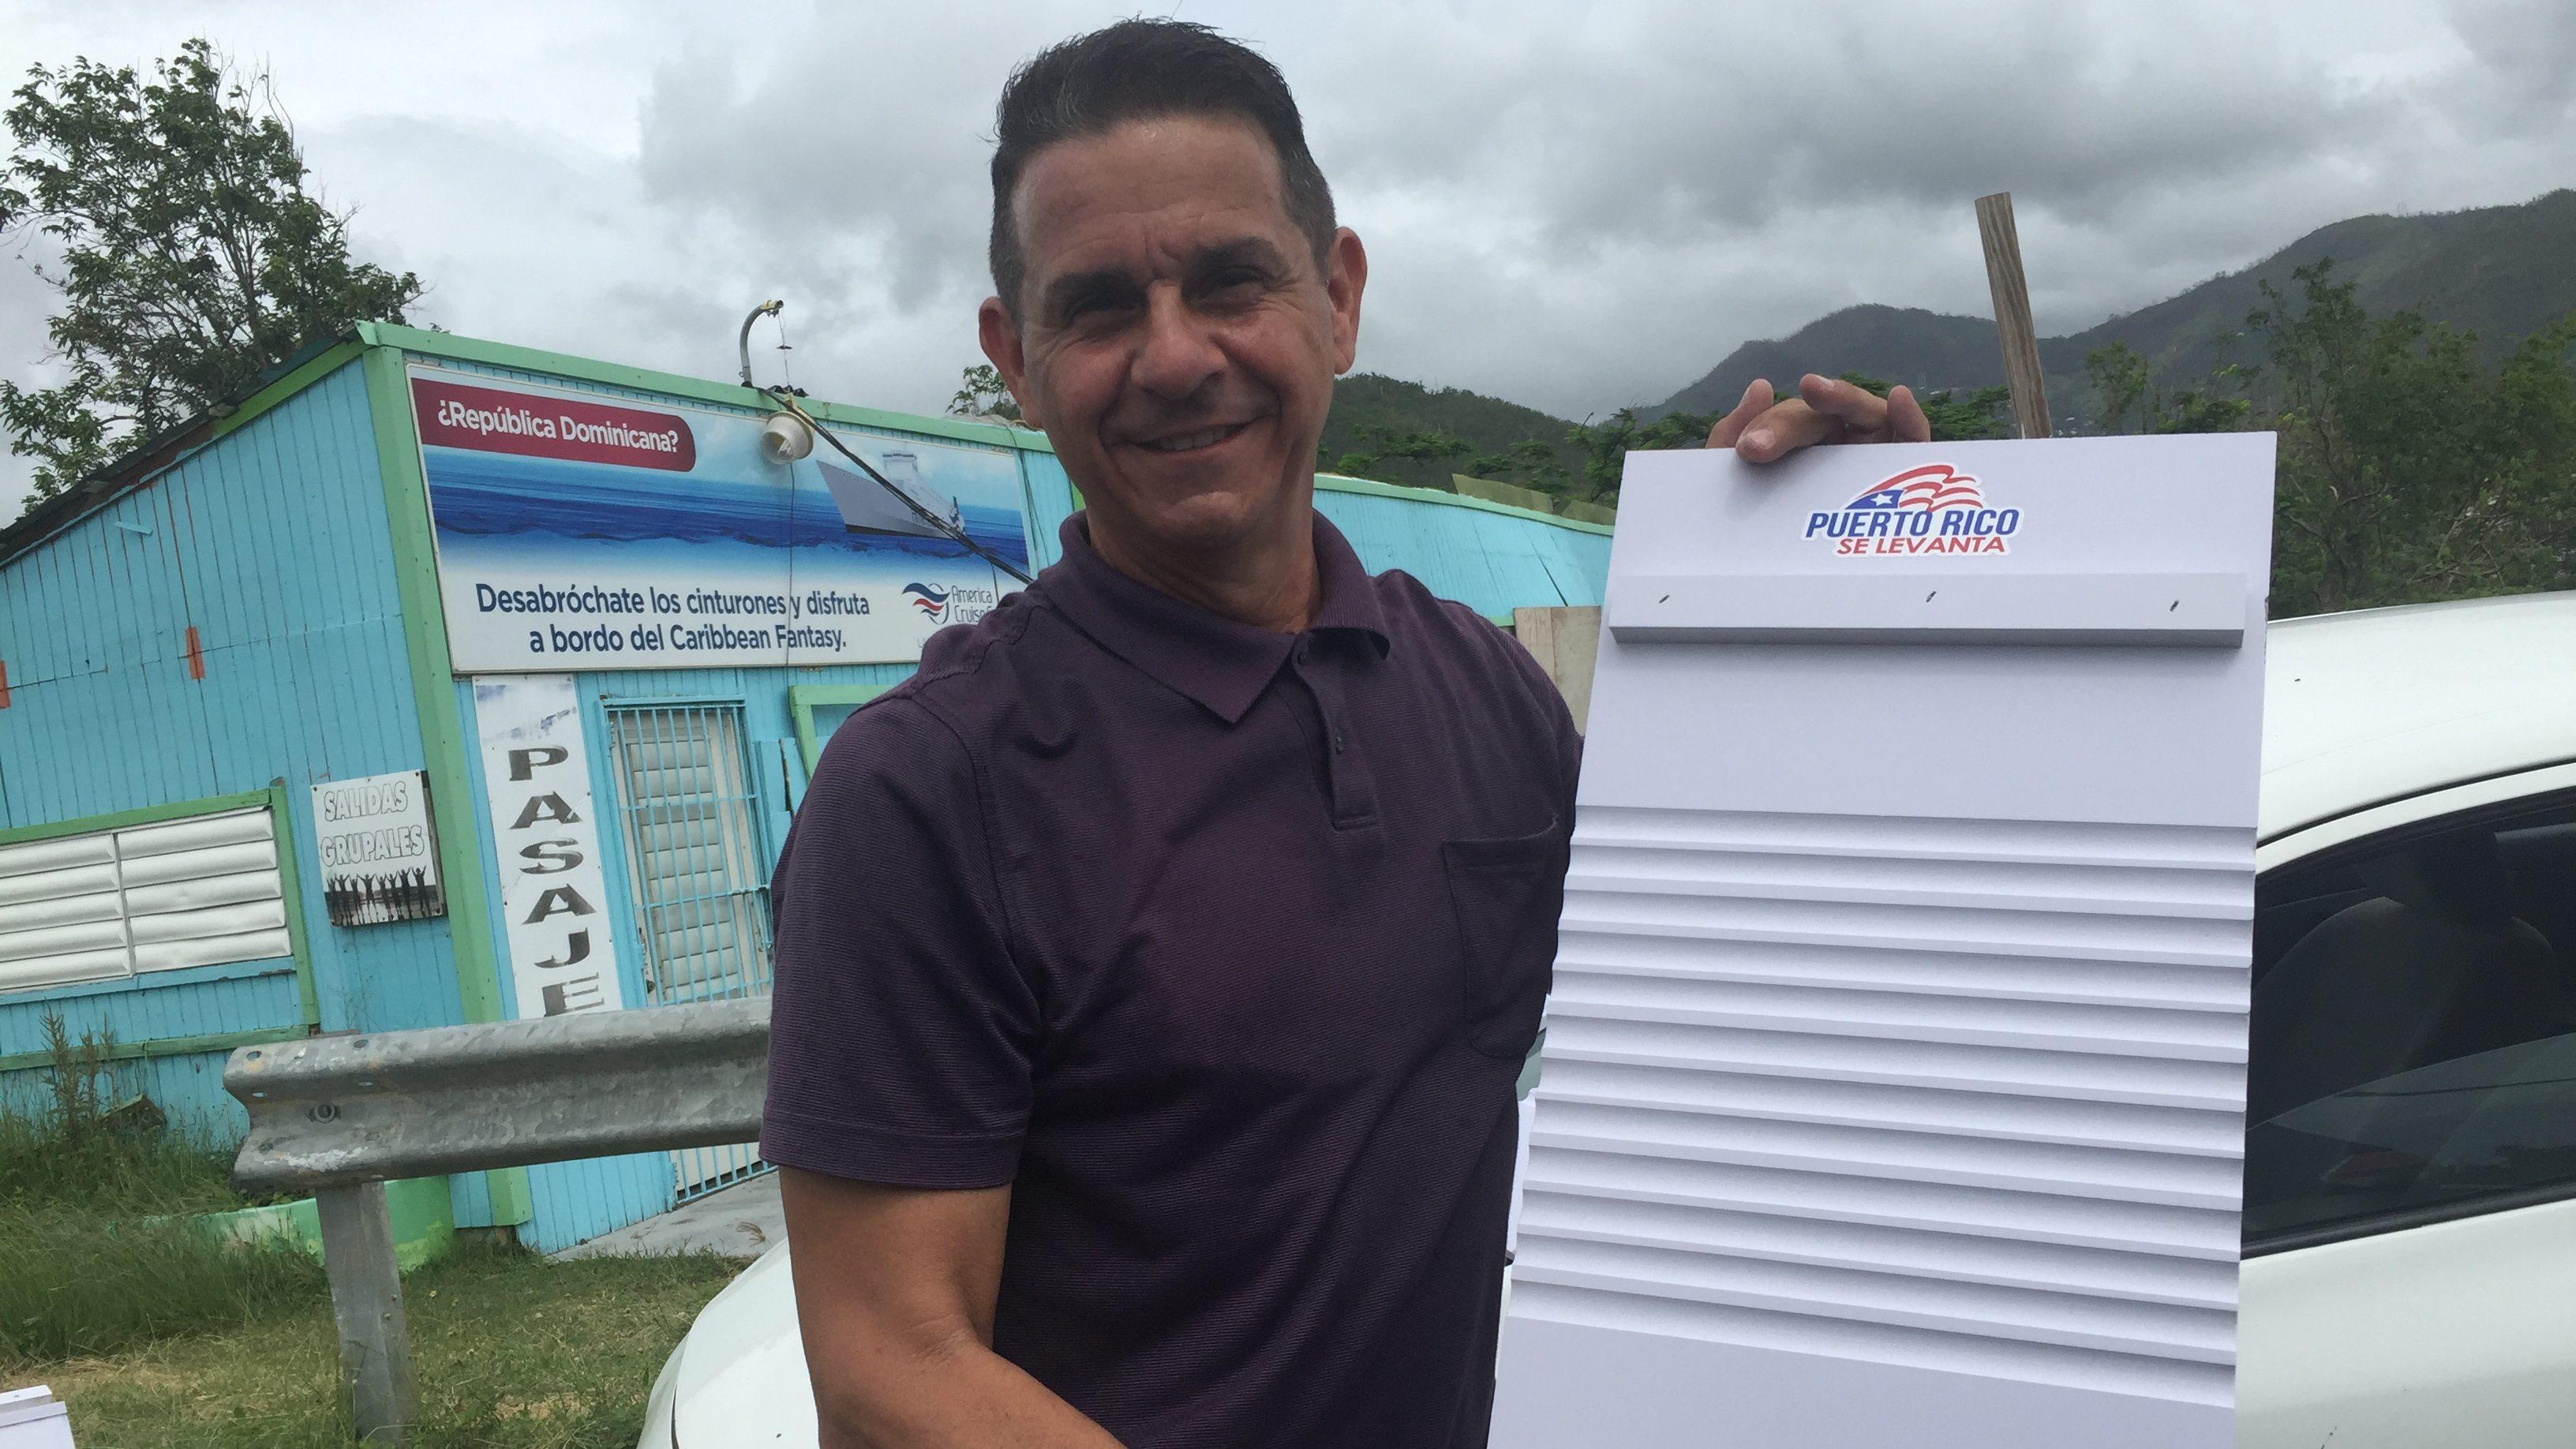 puerto rico washboard